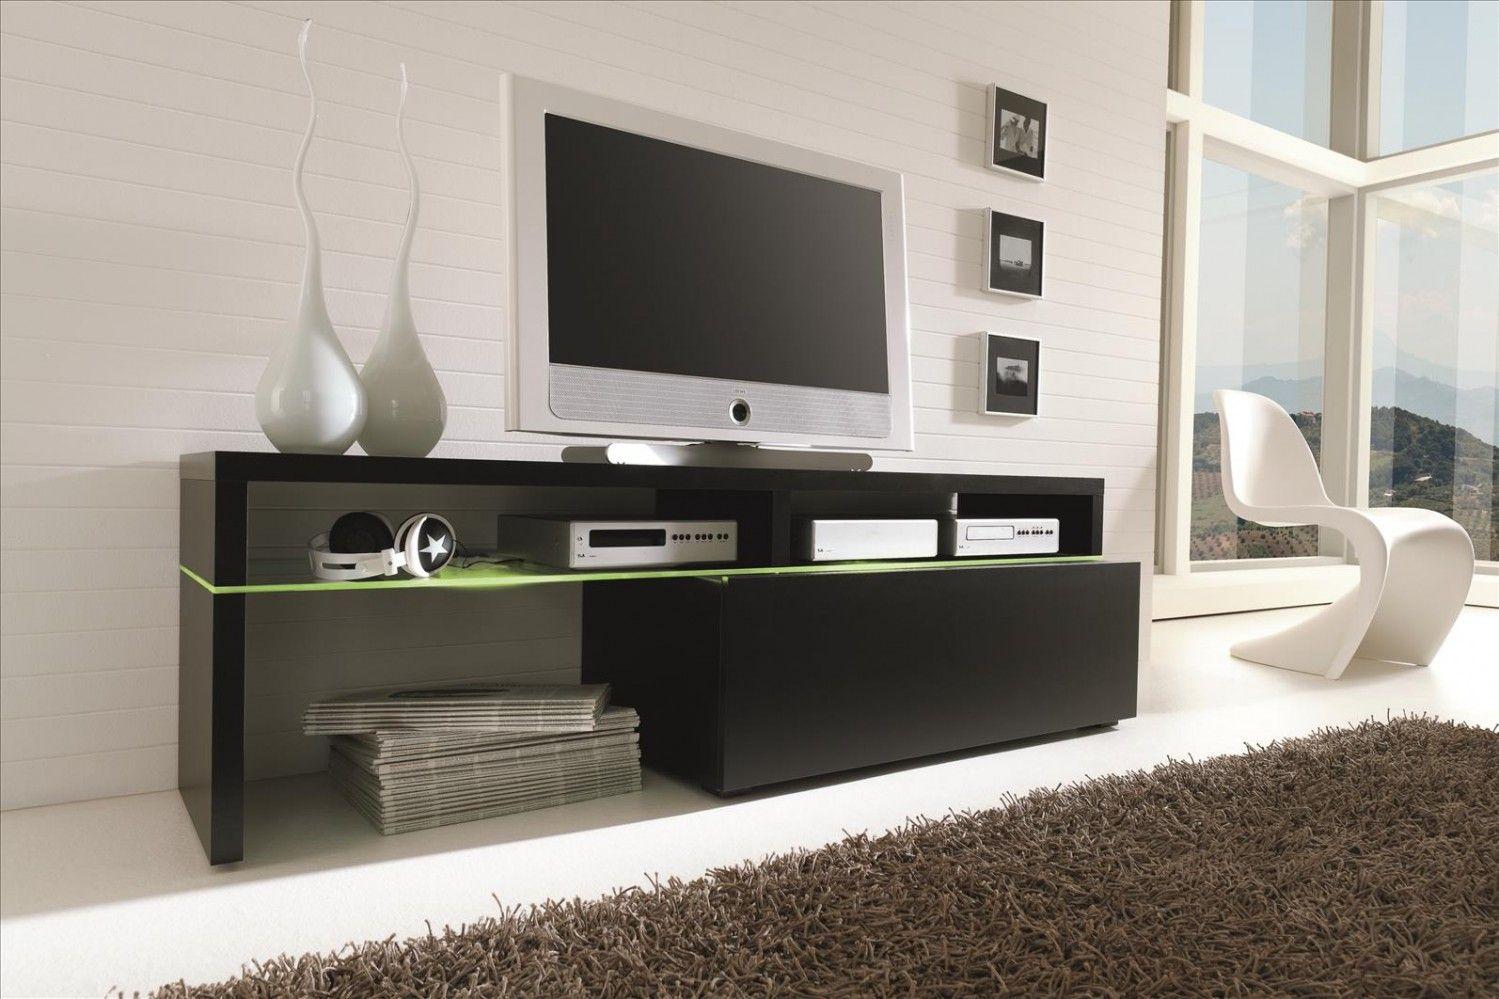 Amsterdam Cs 11340 Tv Stand Living Room Tv Latest Cupboard